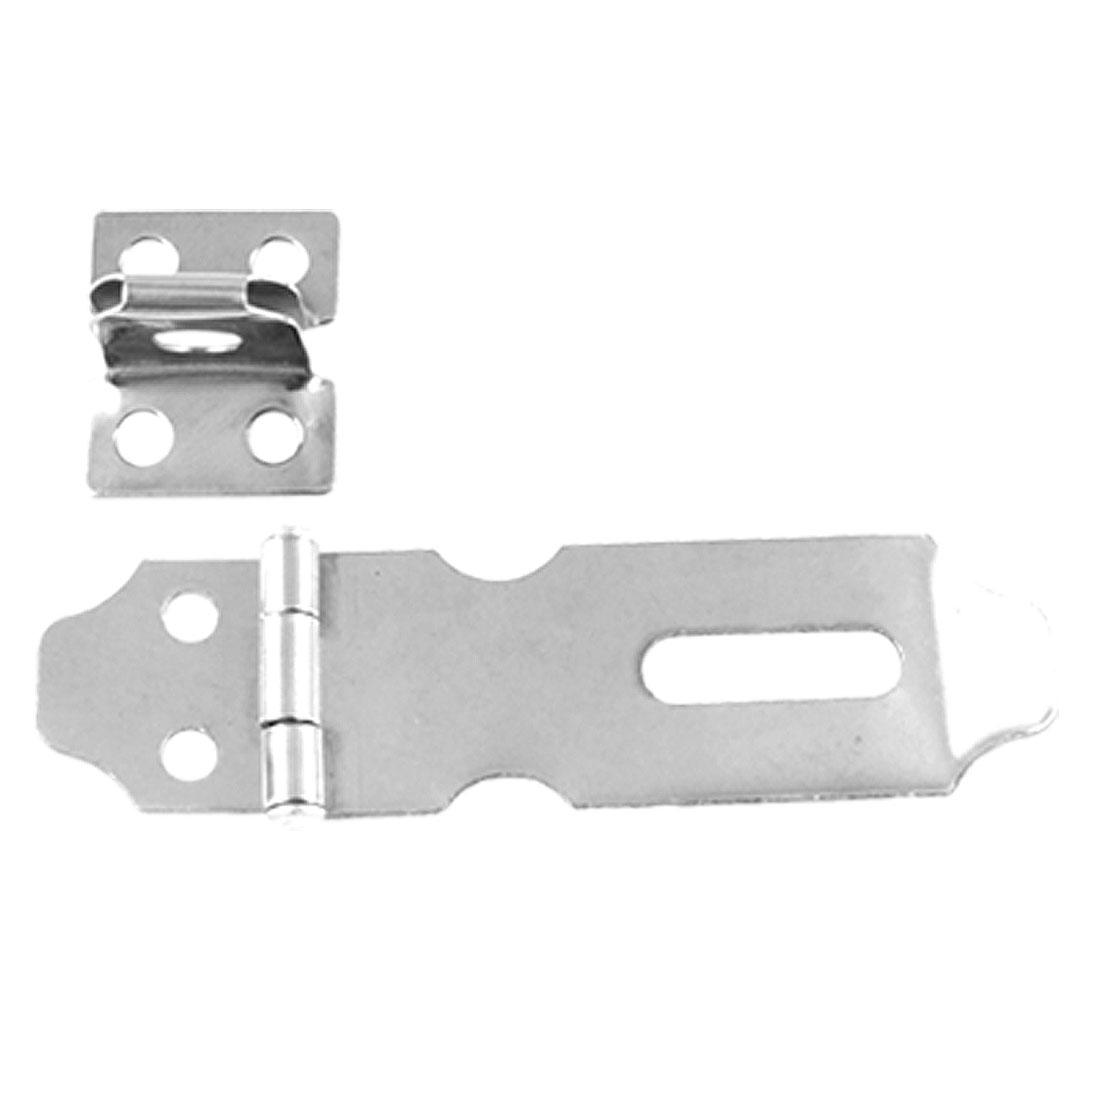 Silver Tone Metal Hasp Staple 5 Pcs for Door Cabinet